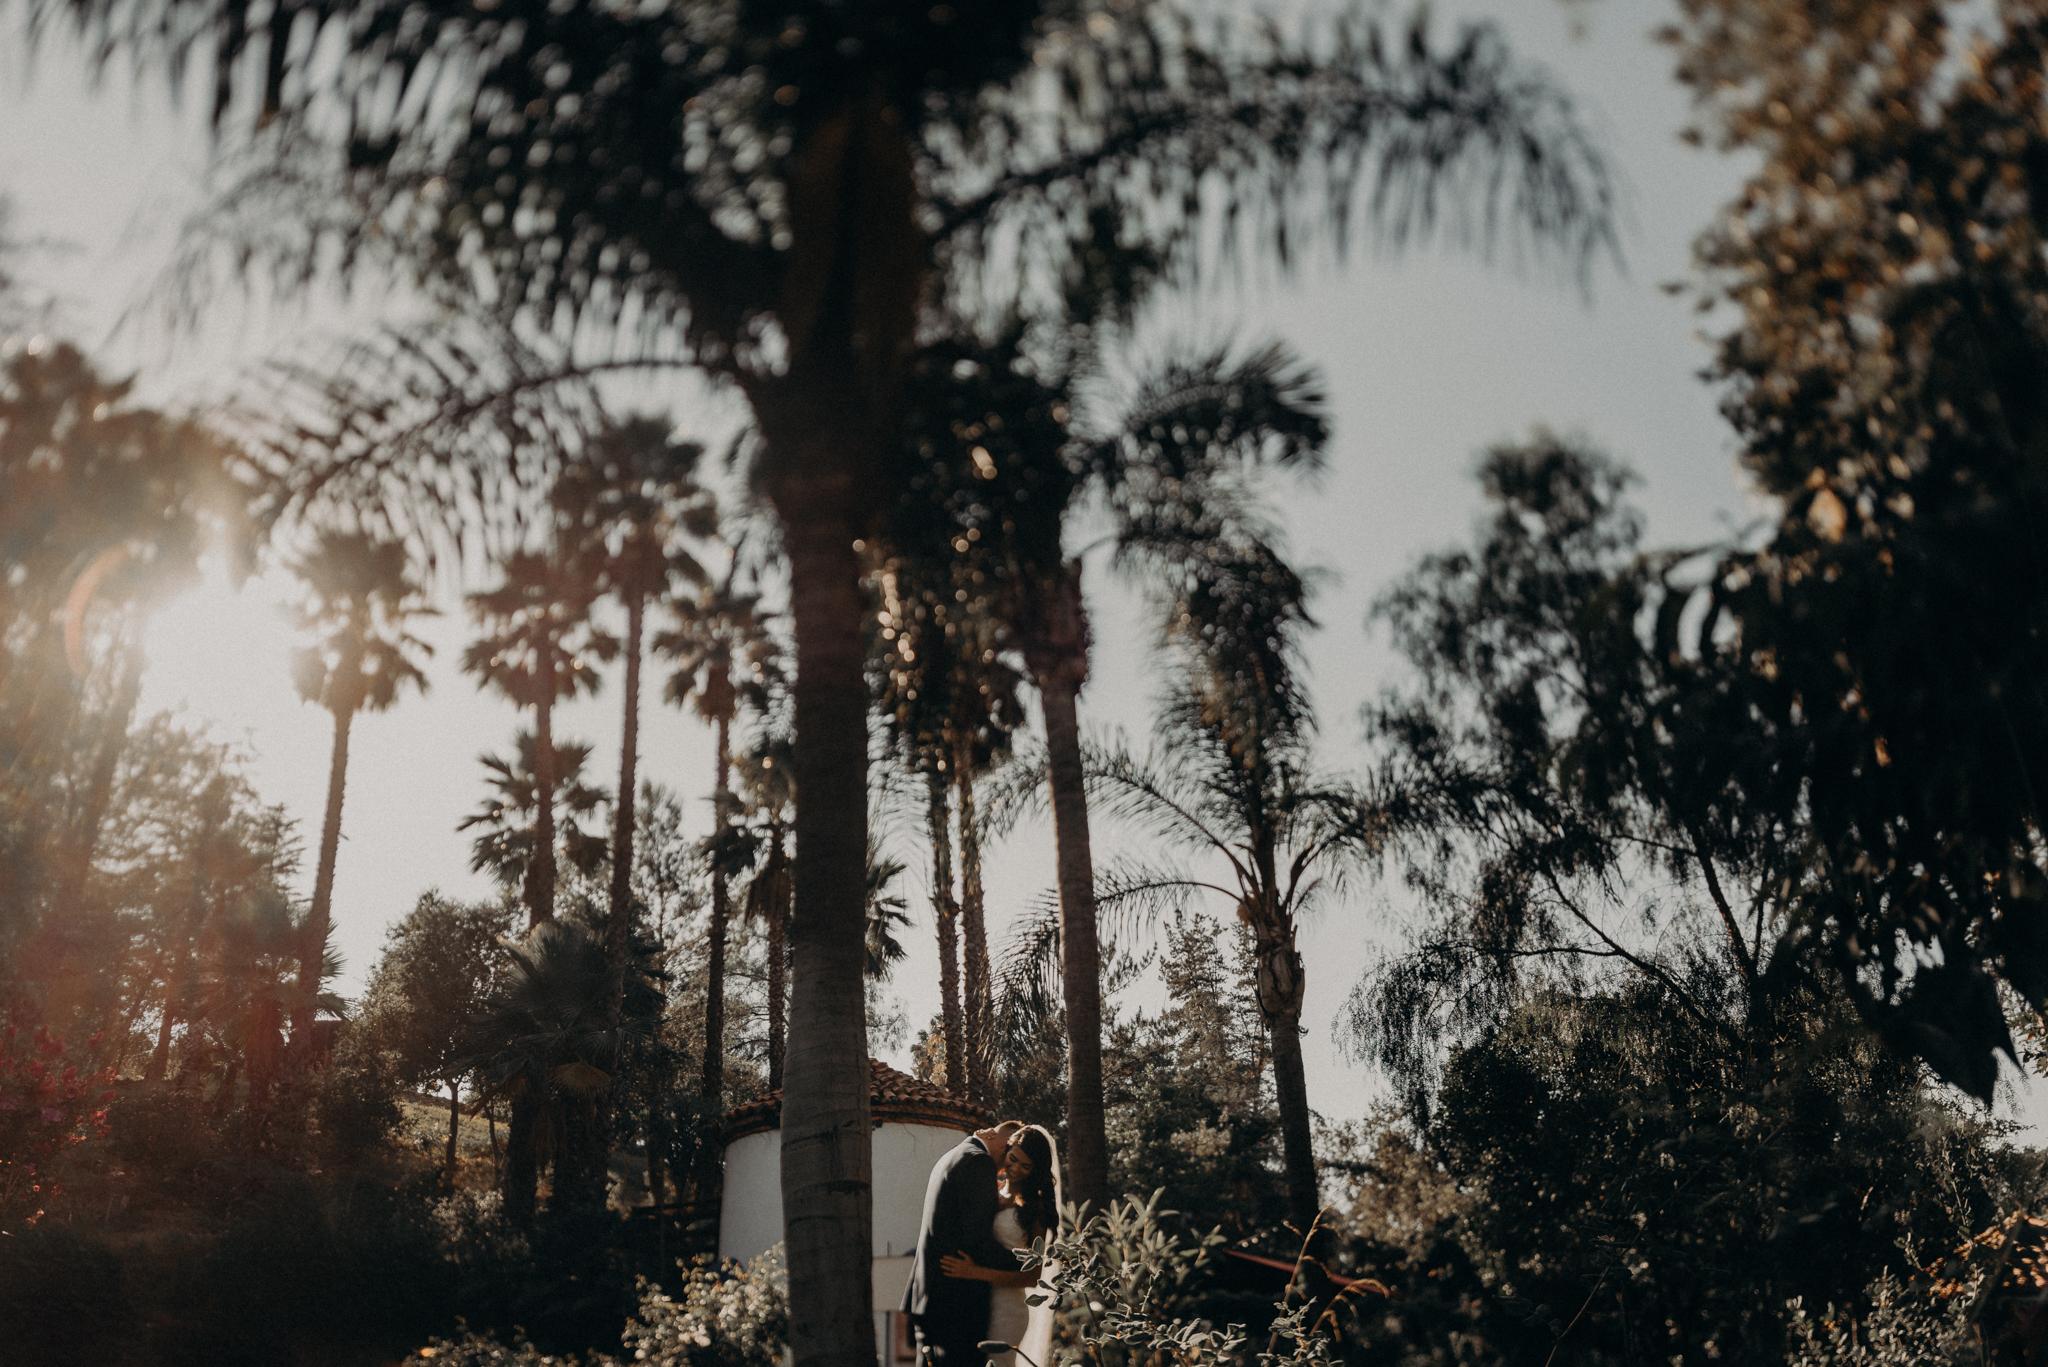 Isaiah + Taylor Photography - Rancho Las Lomas Wedding, Los Angeles Wedding Photographer-090.jpg